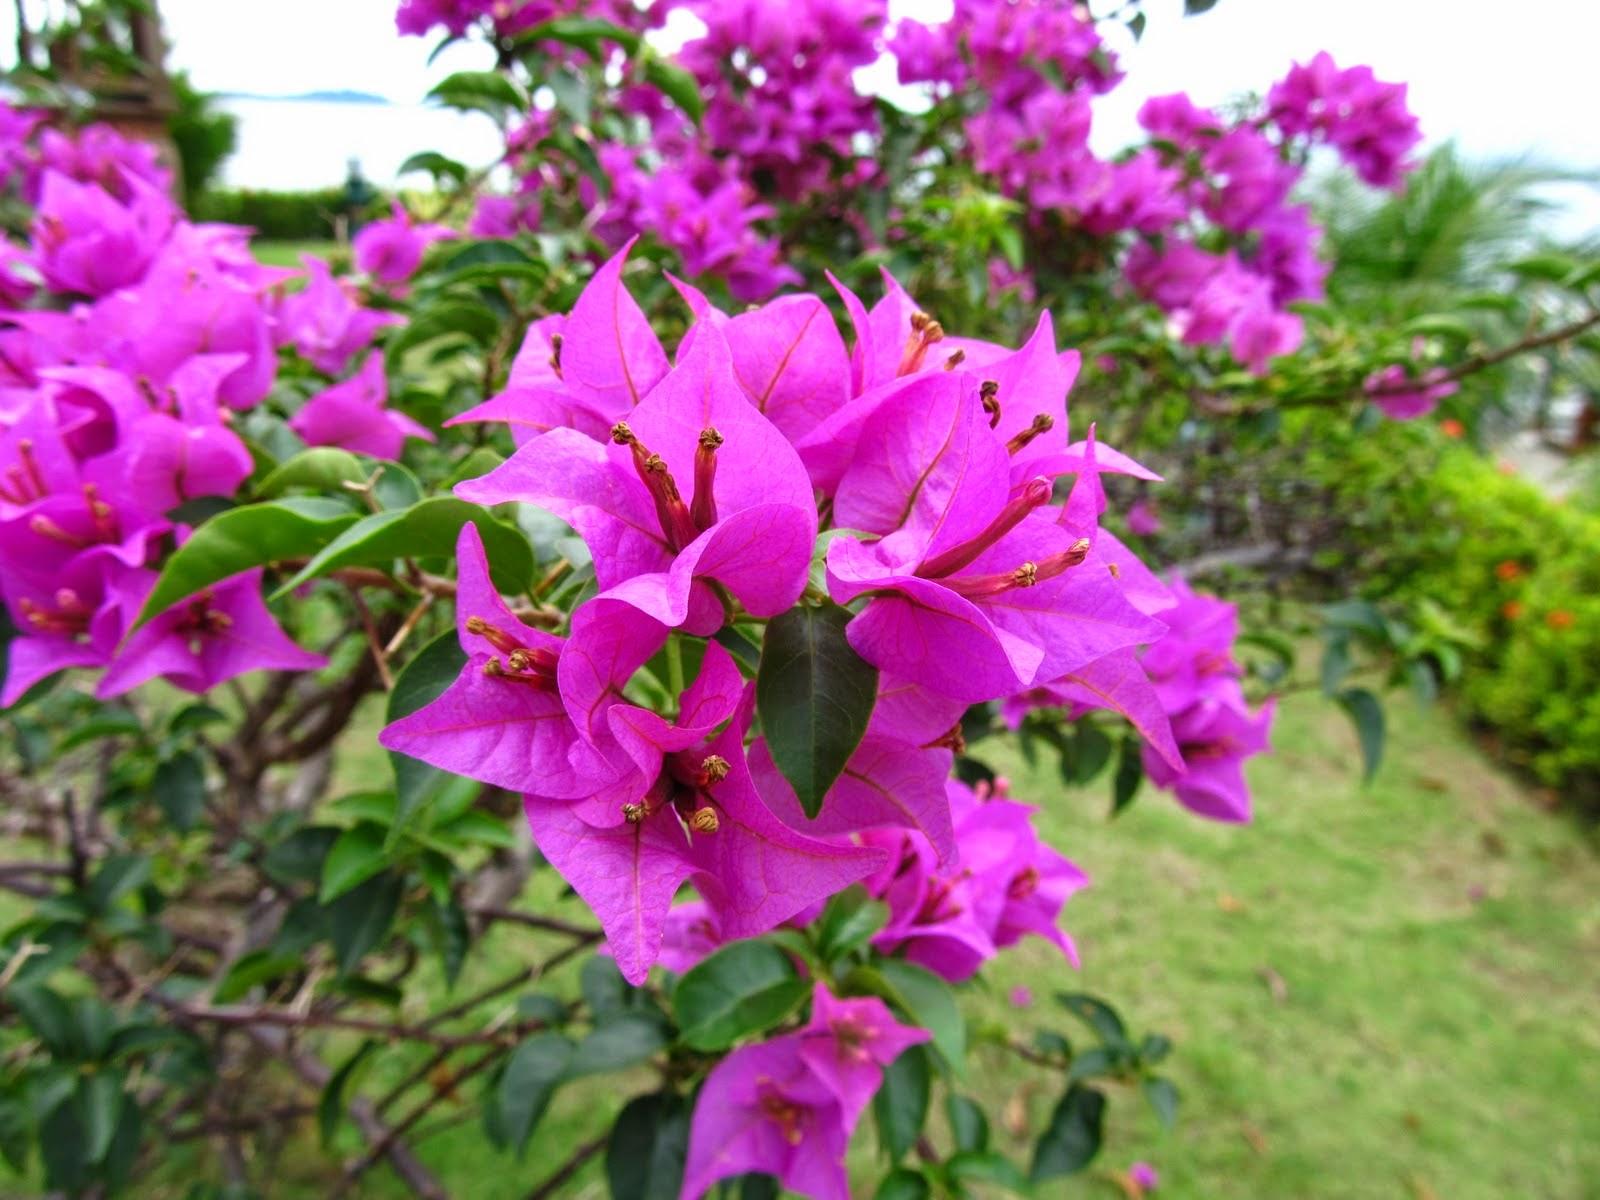 Contoh bunga sempurna pada tanaman bunga | Manfaat di ...